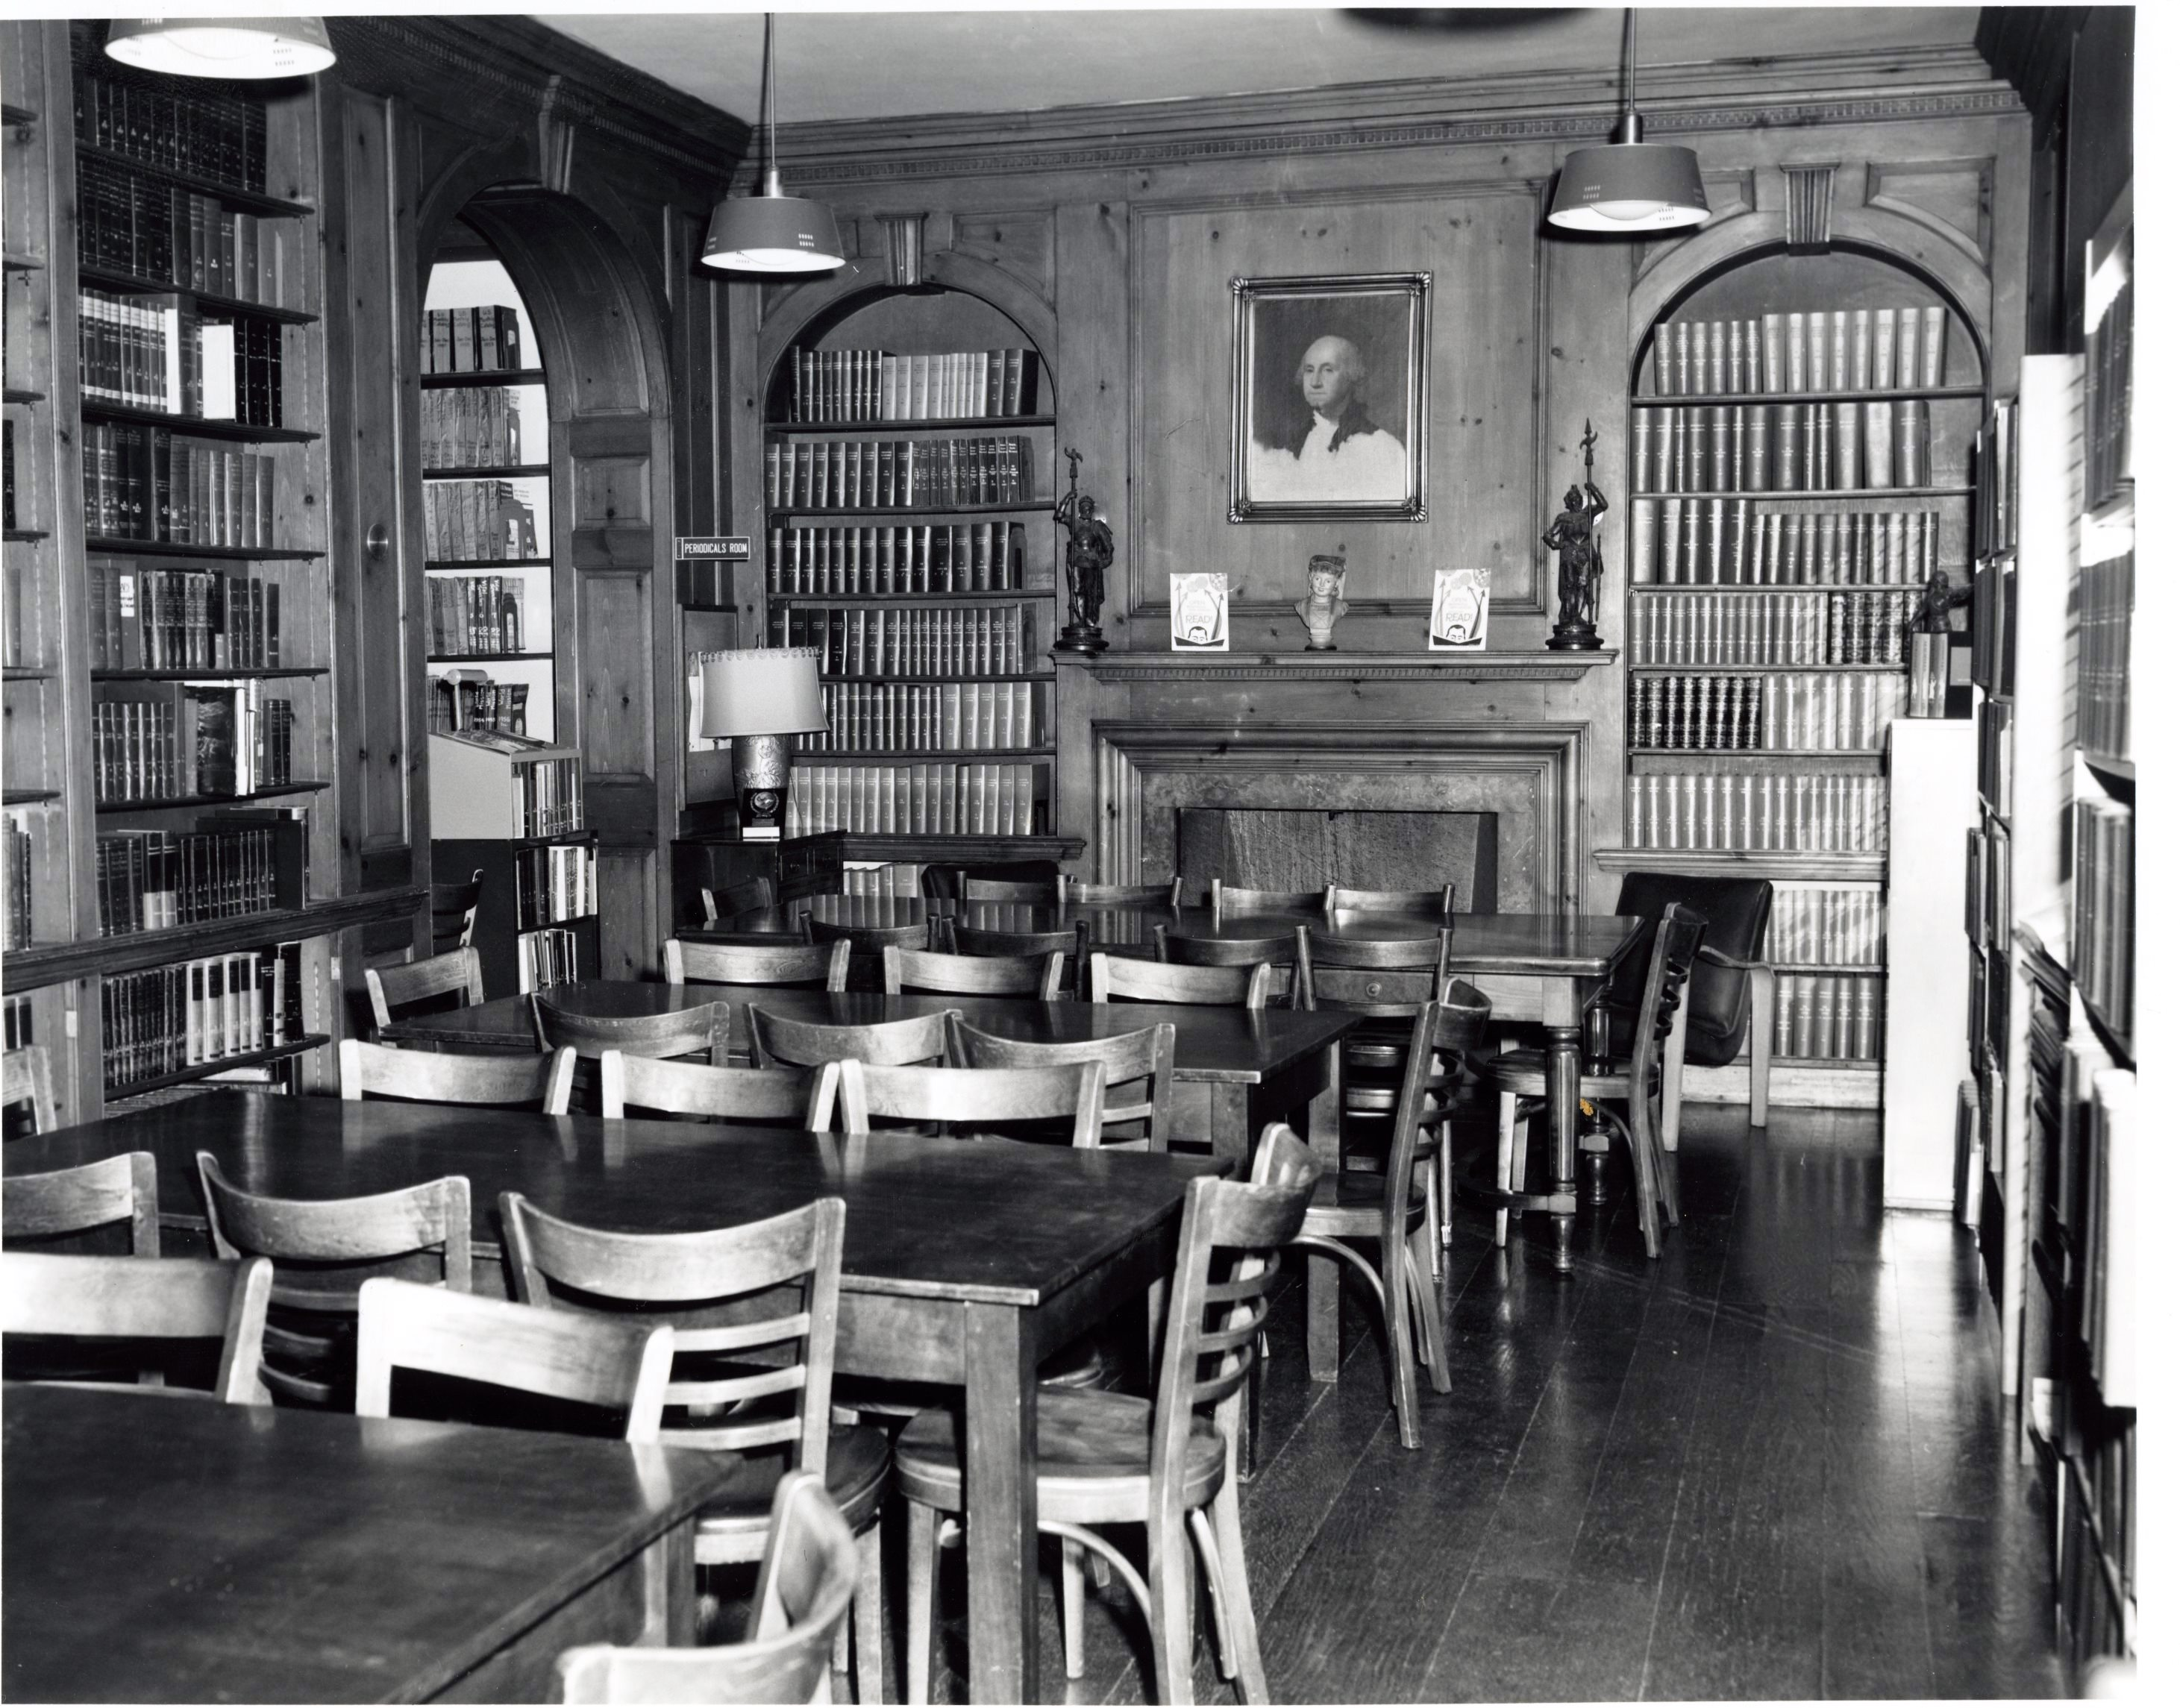 MMC's pre-1974 library